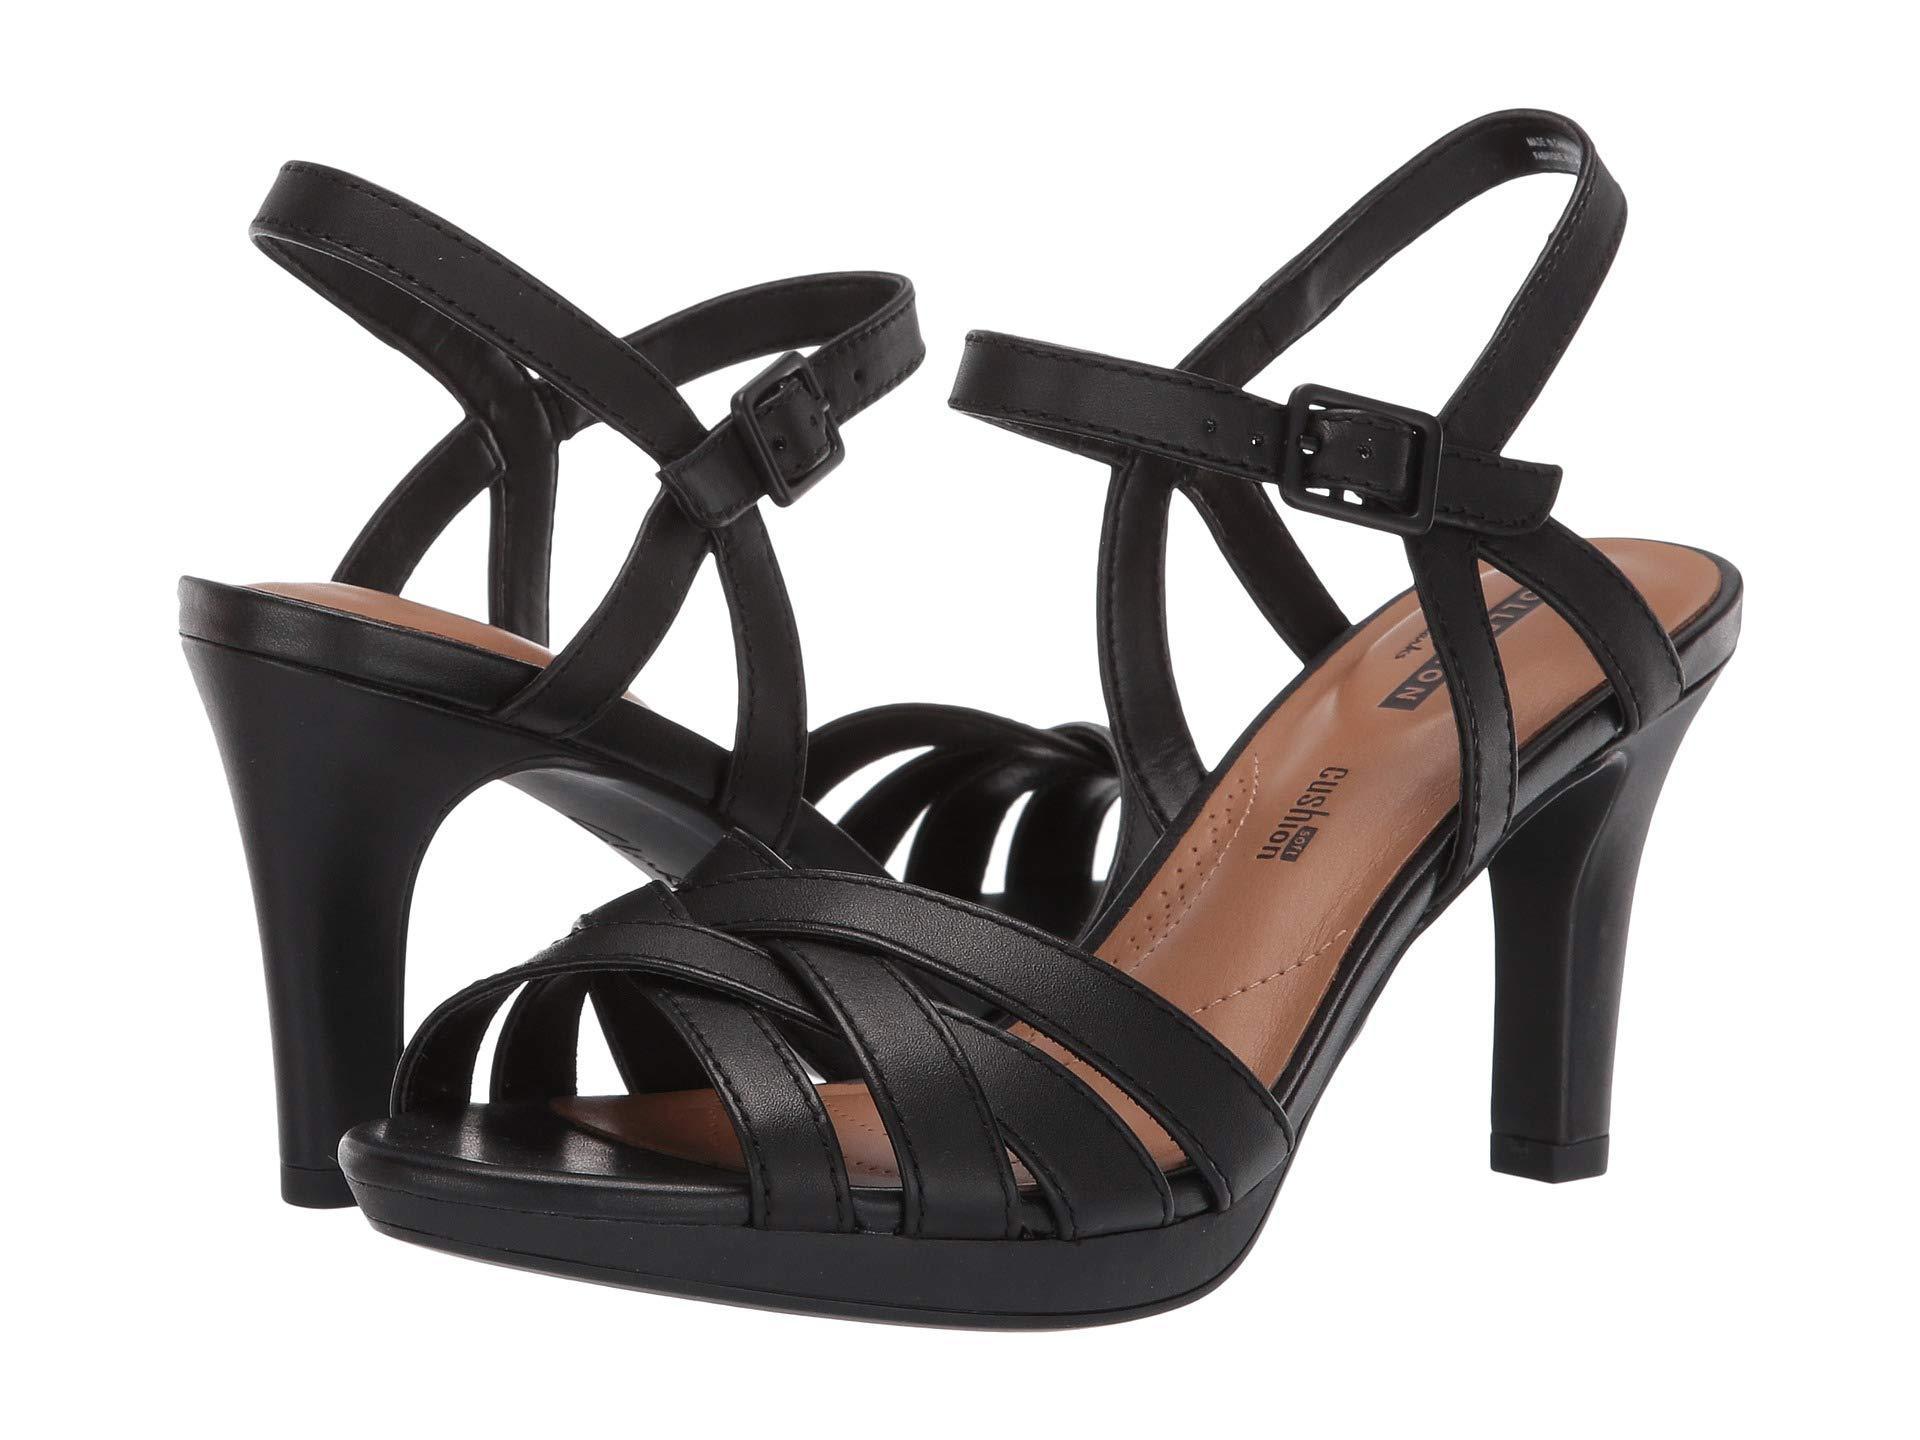 8f535c0c548 Lyst - Clarks Adriel Wavy (dusty Pink Leather) High Heels in Black